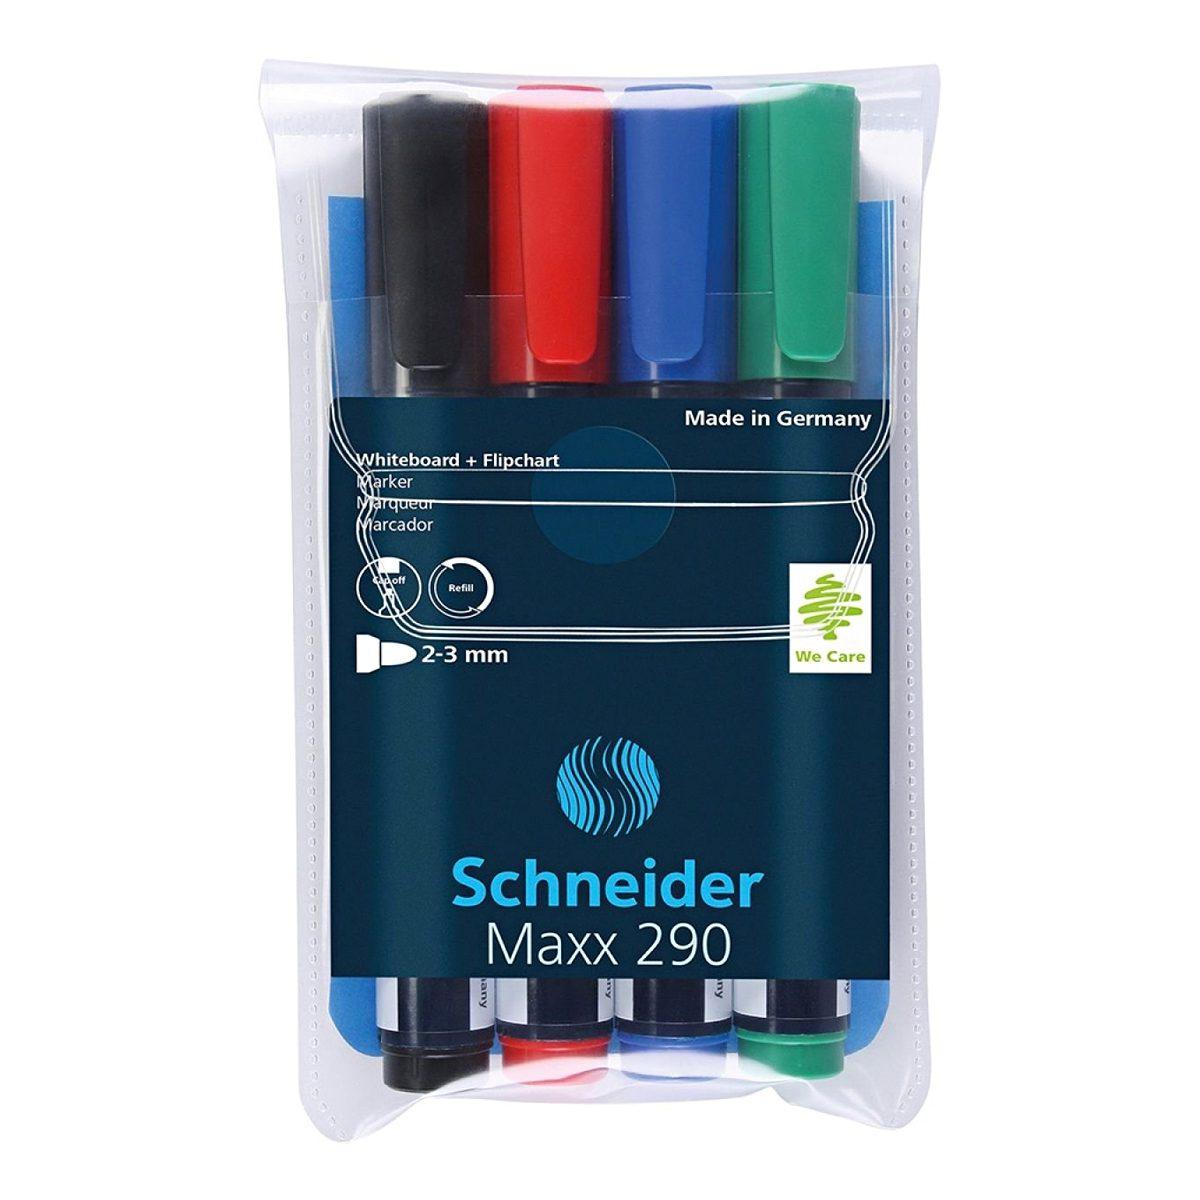 Whiteboard Marker, Maxx 290, Diverse Culori, Schneider, 2931